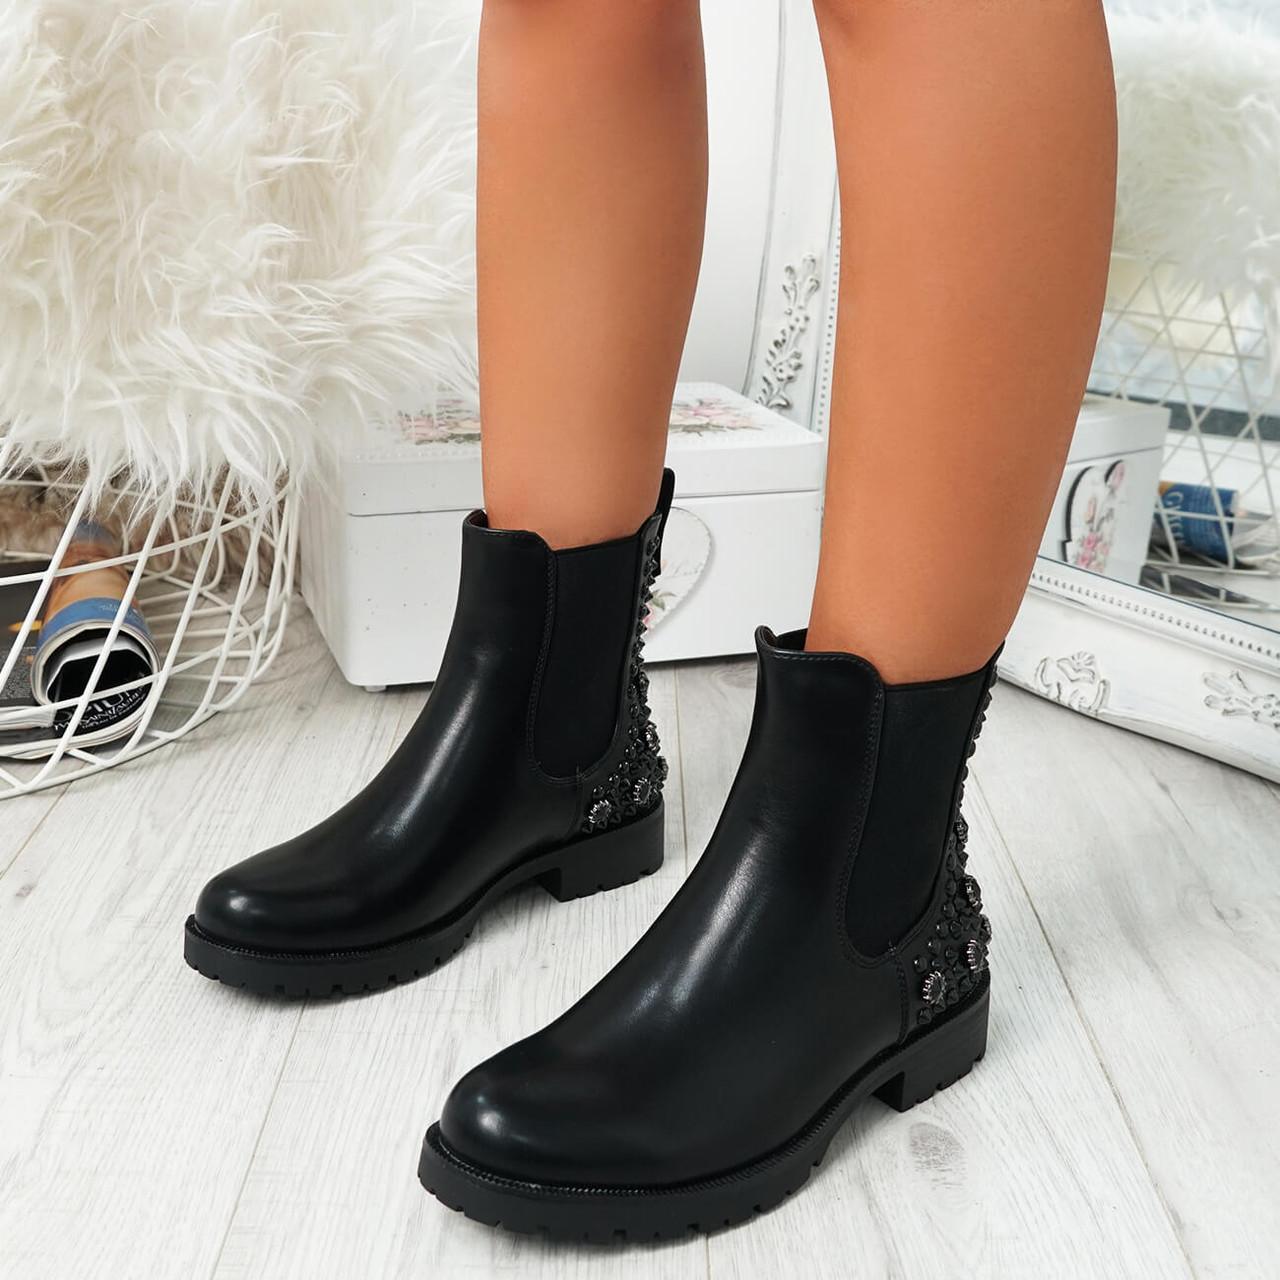 Bavva Black Pu Studded Ankle Boots - 1